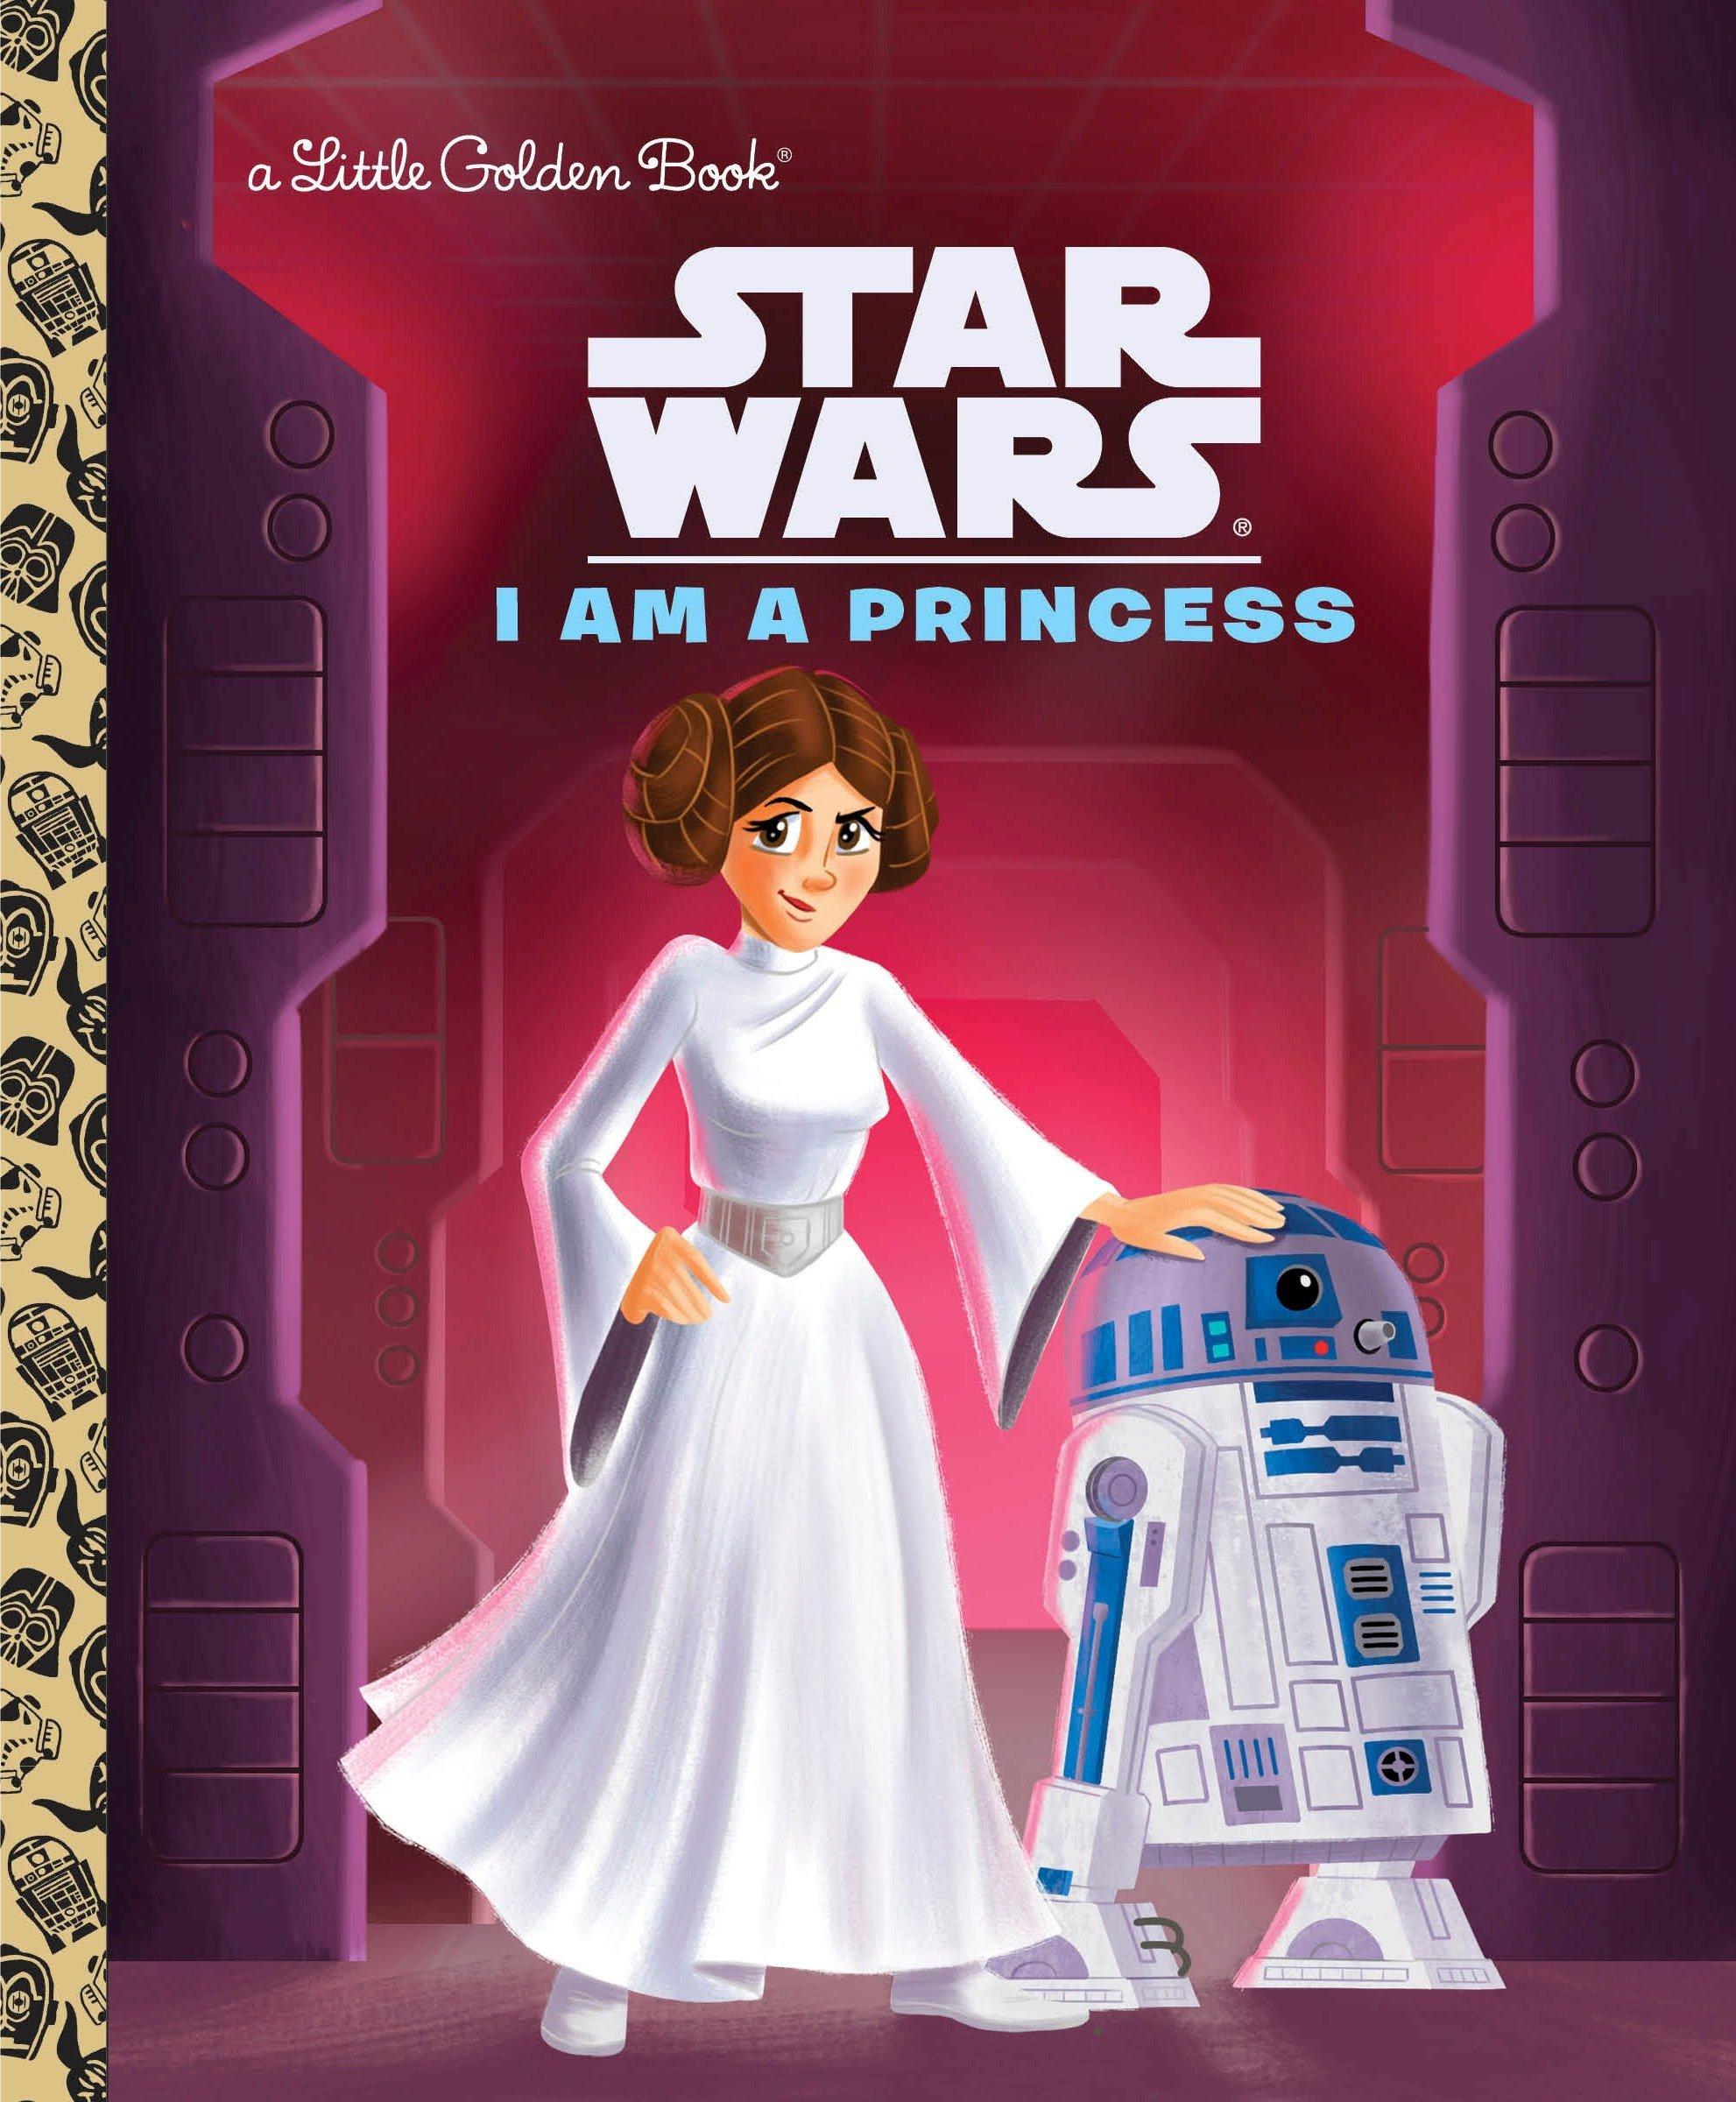 I Am a Princess (Star Wars) (Little Golden Book): Courtney Carbone, Heather  Martinez: 9780736436052: Amazon.com: Books